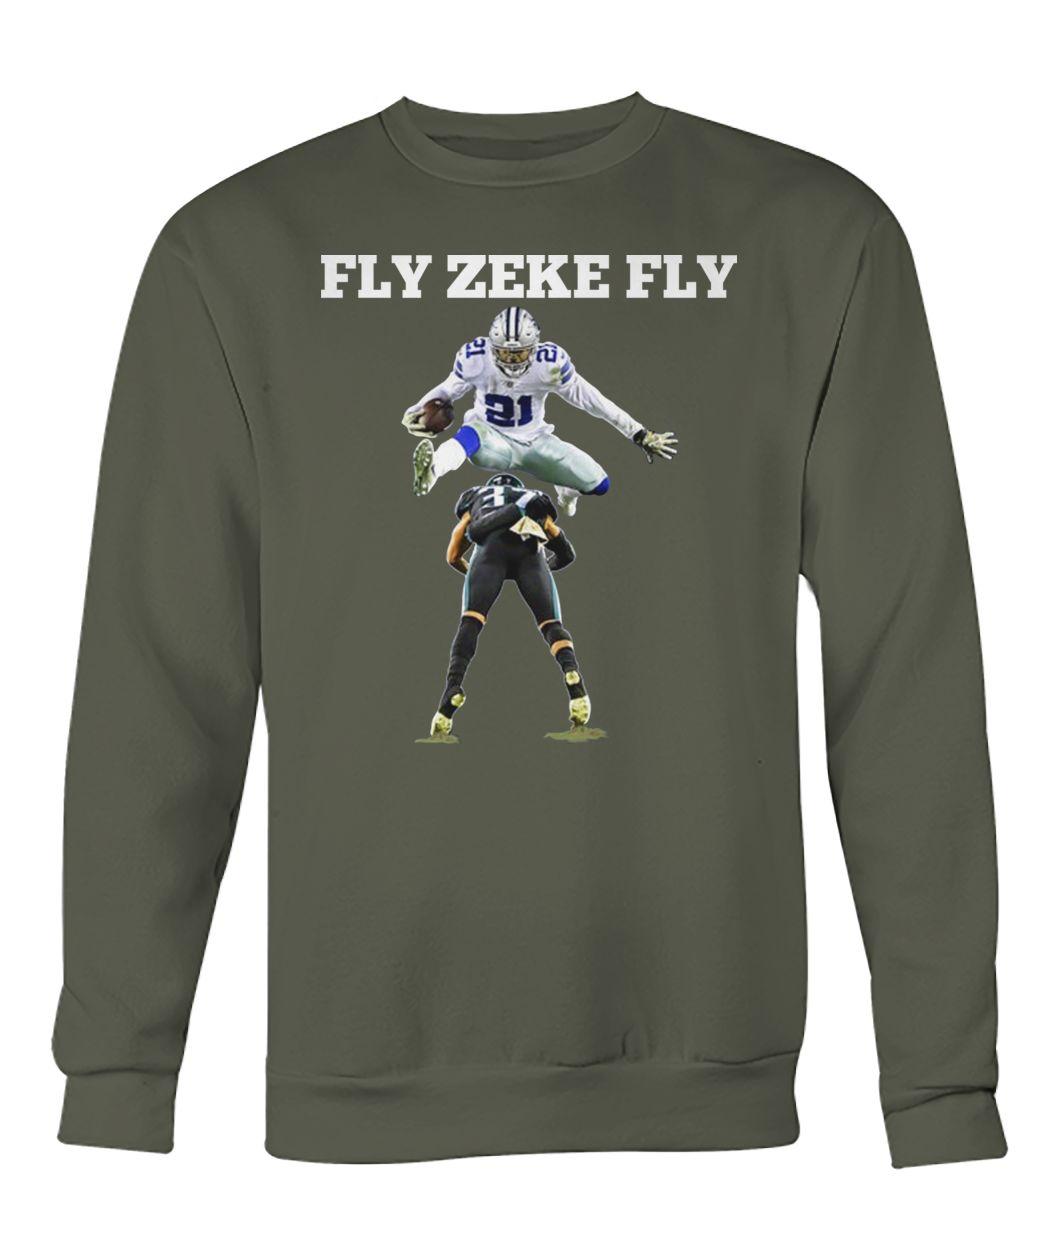 8663c1a8fe6 Ezekiel elliott fly zeke FLY shirt - This is my blog christlee193 ...